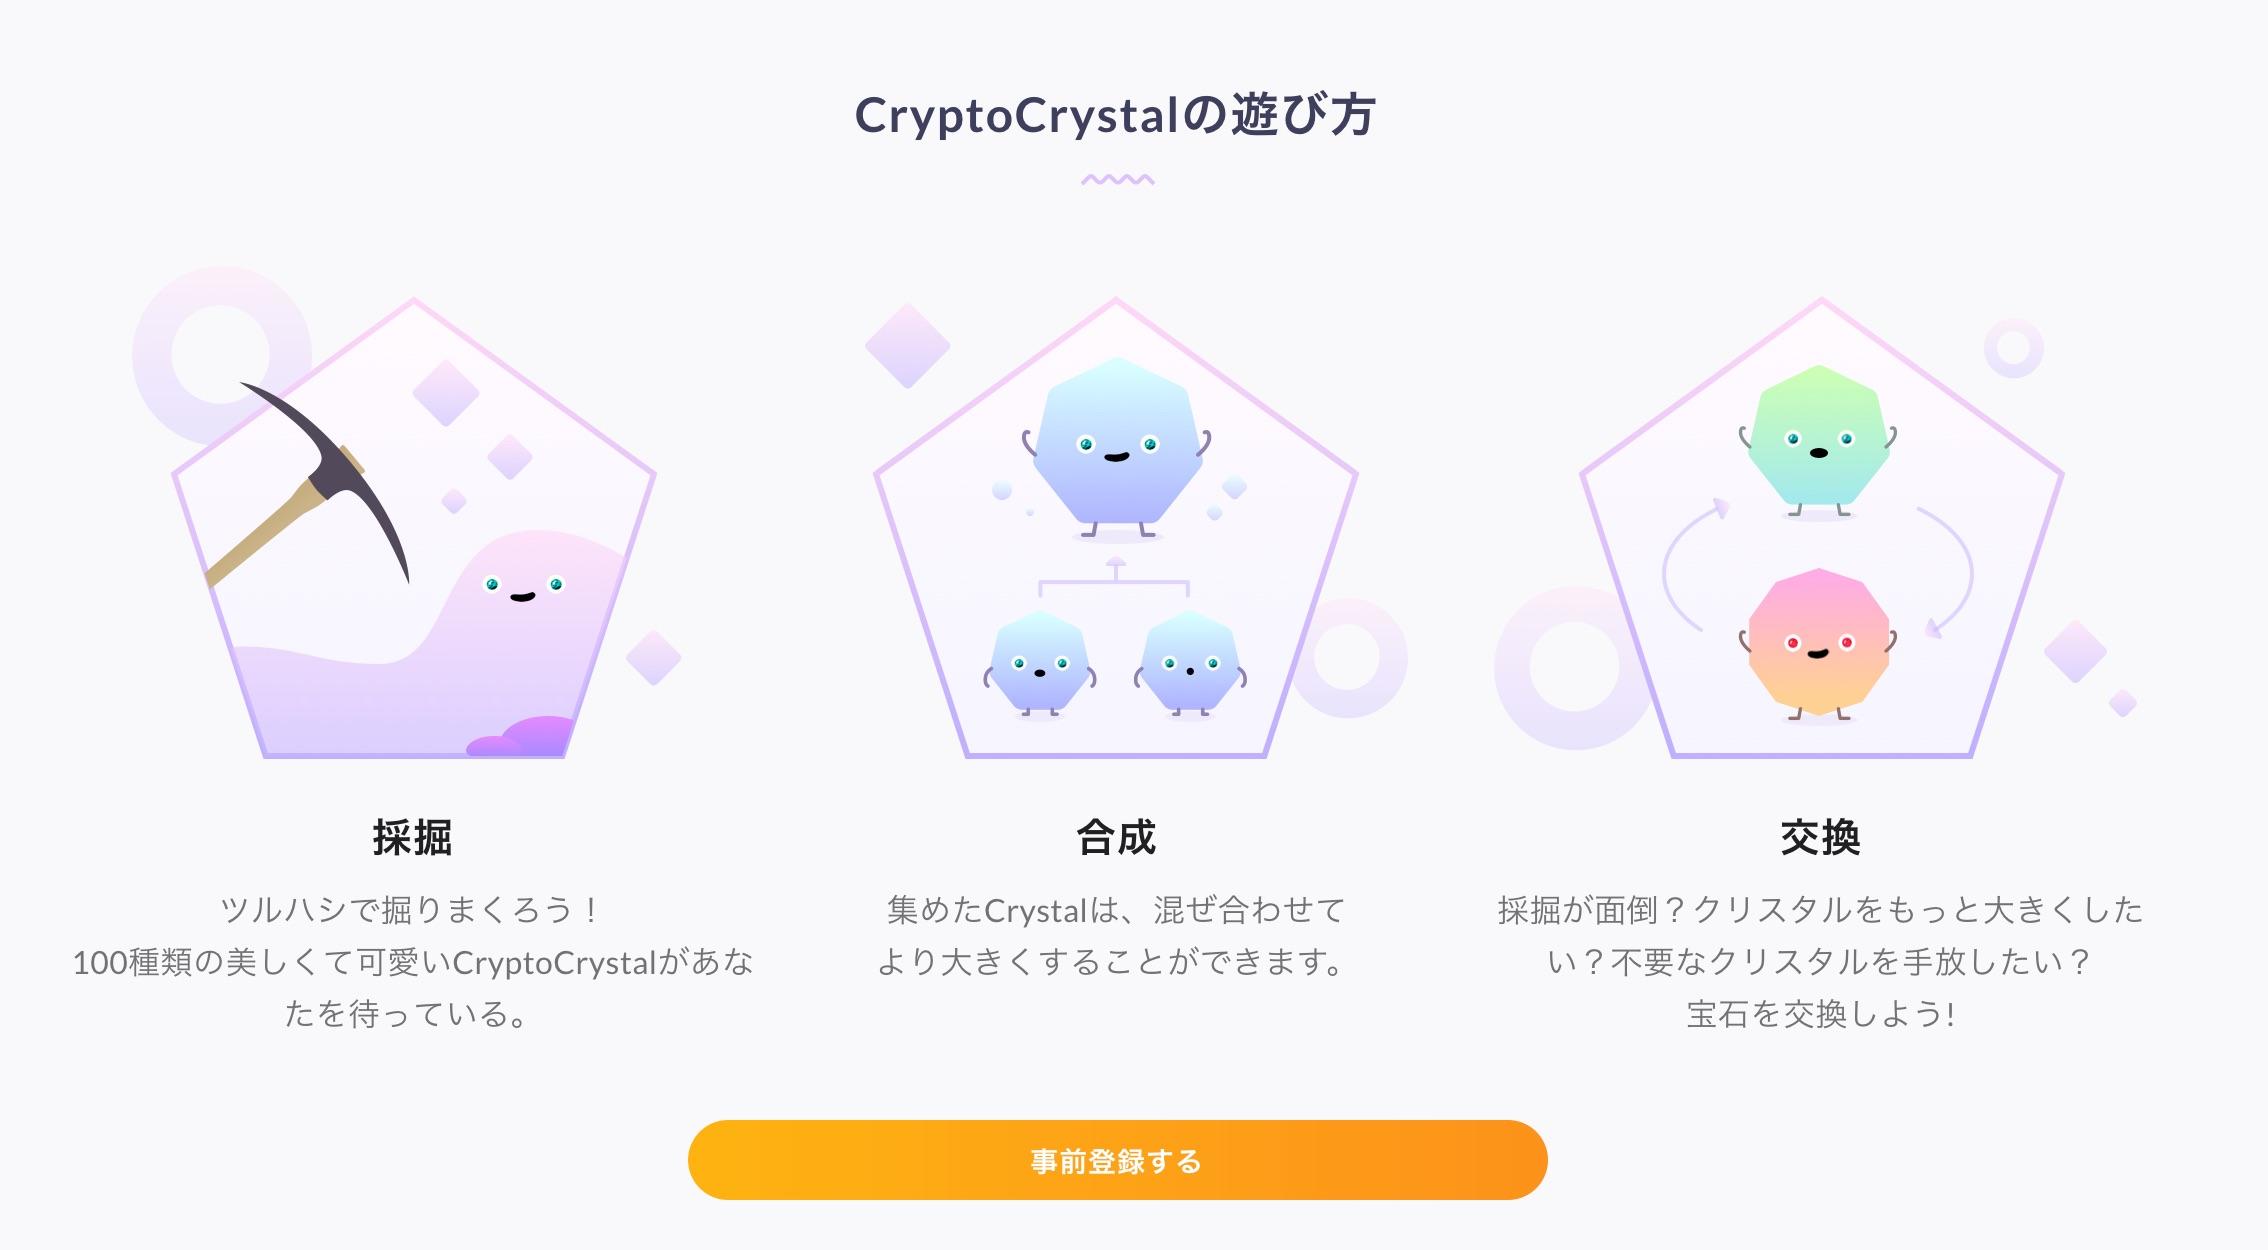 CryptoCrystal2